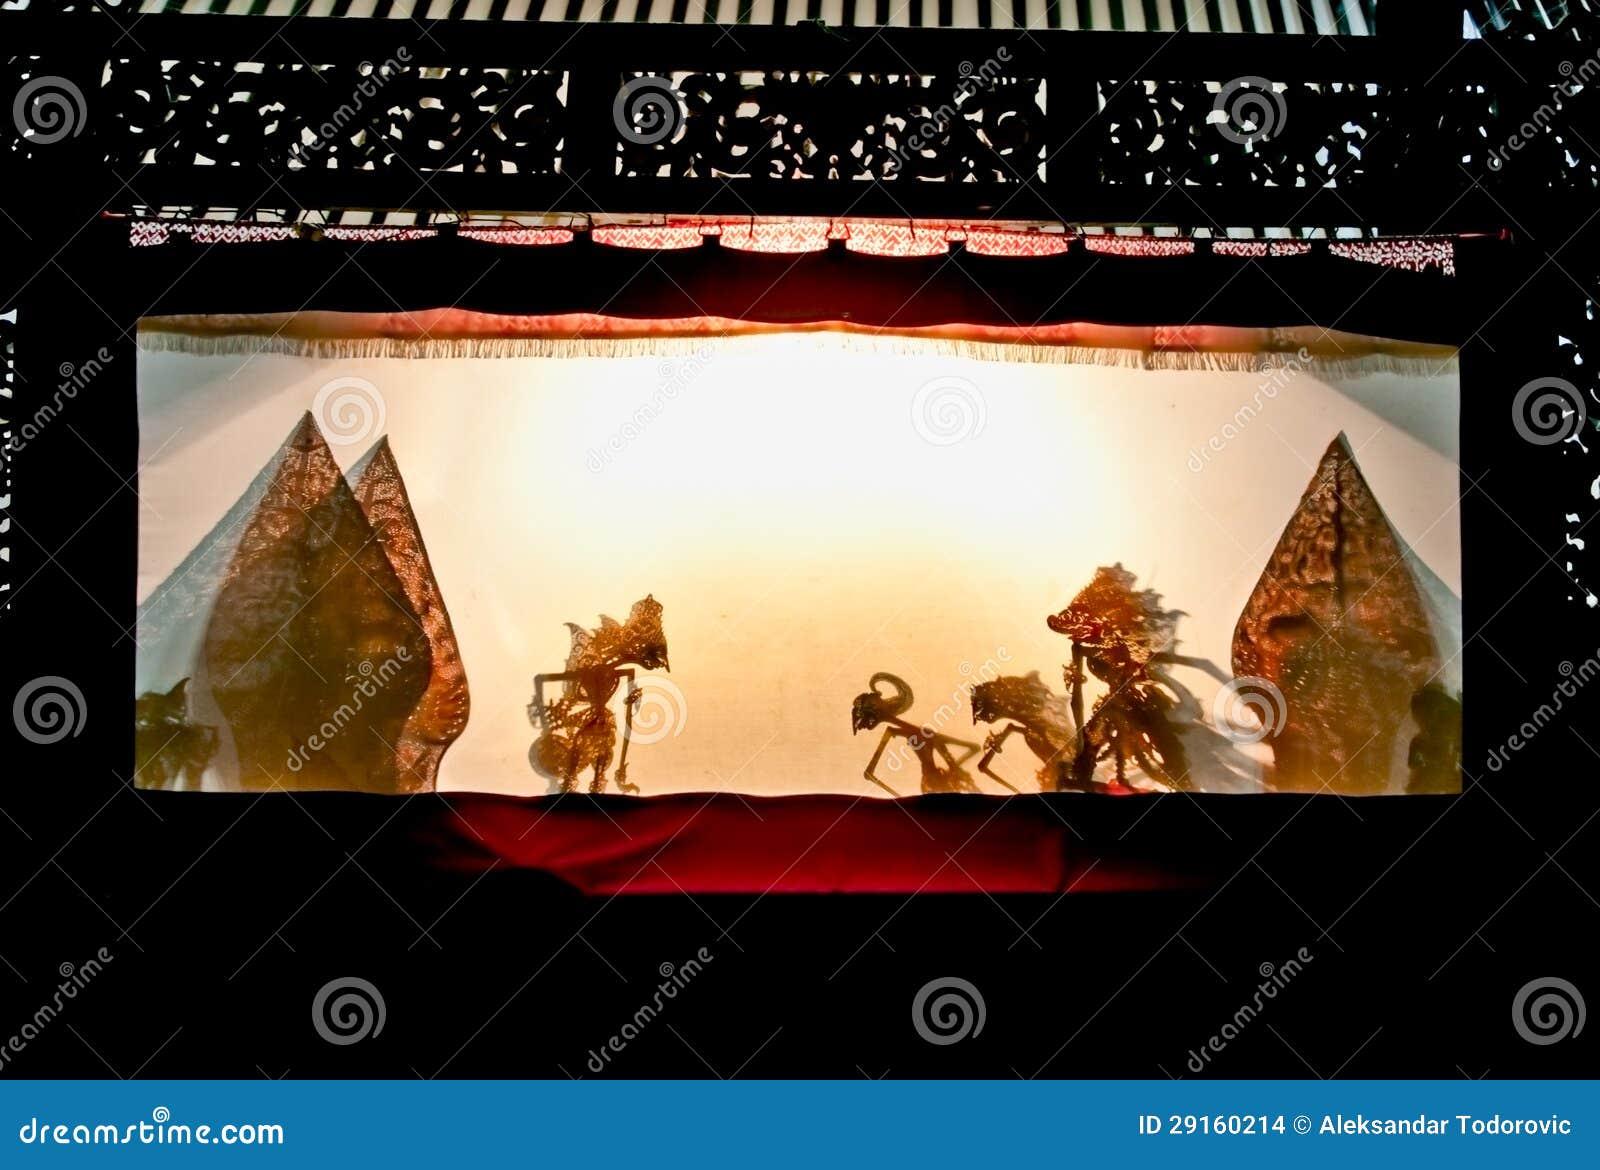 (PDF) Indonesia peoples and Histories Jean Gelman Taylor ...